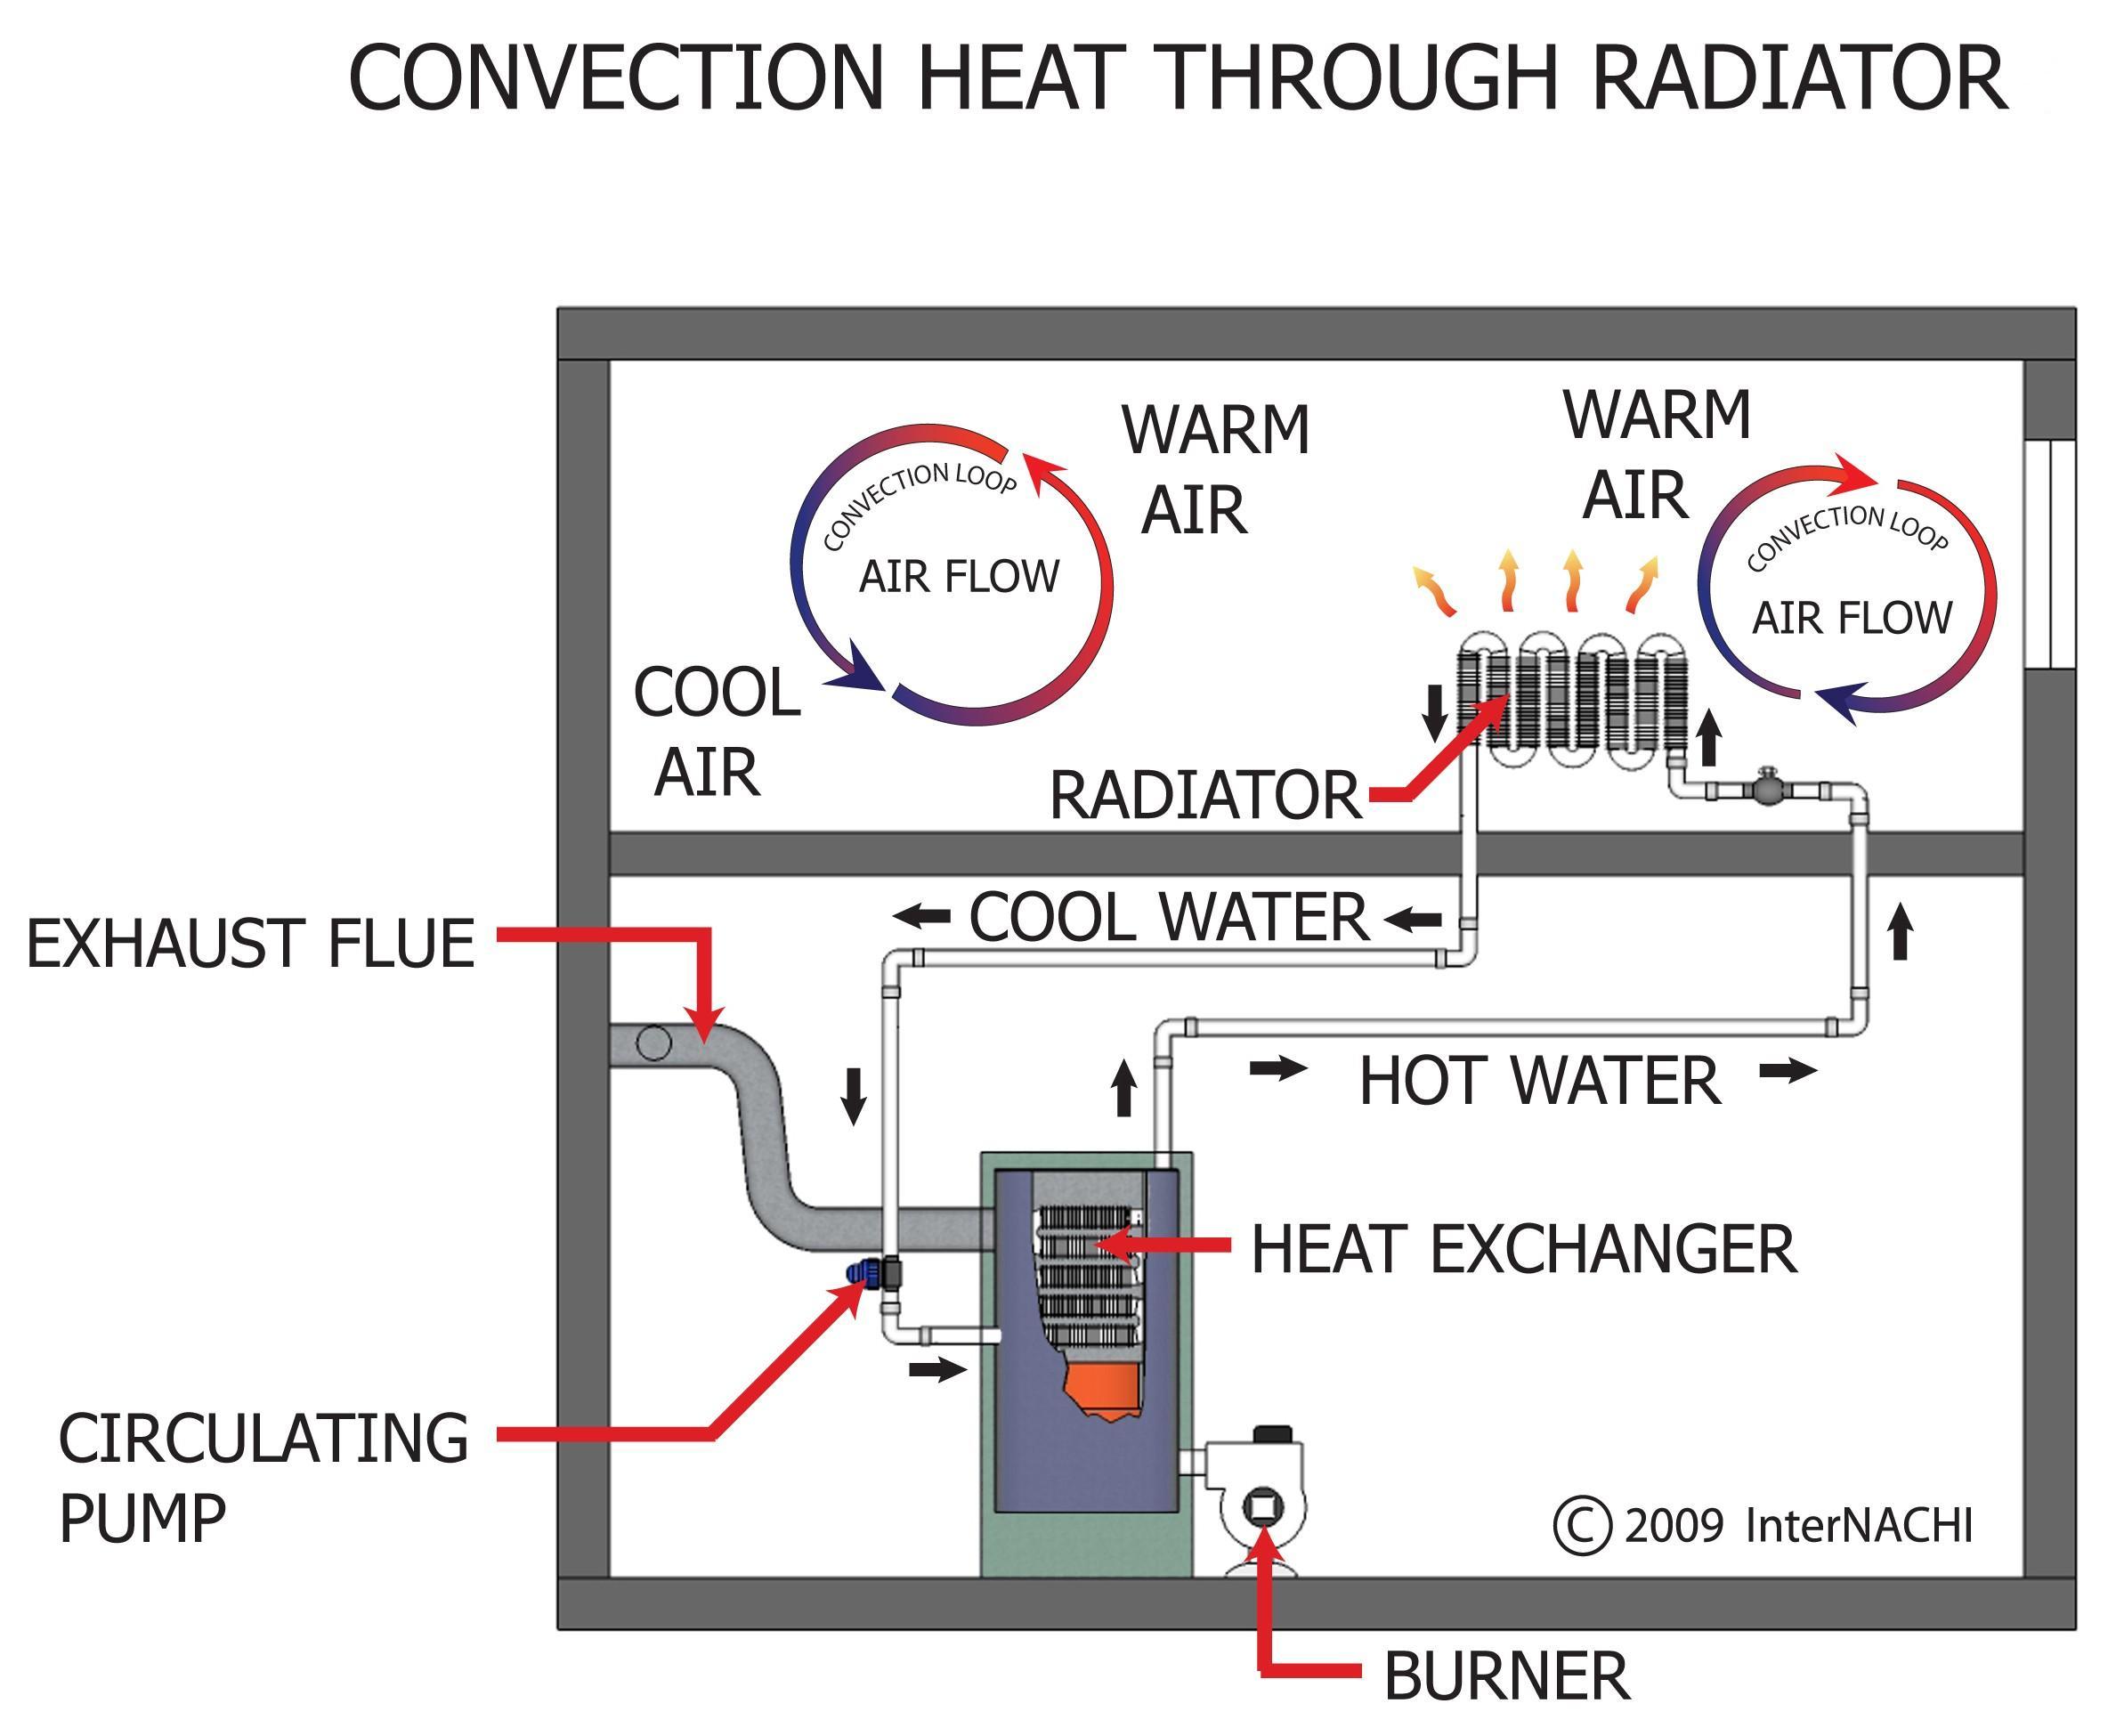 Convection heat through radiator.